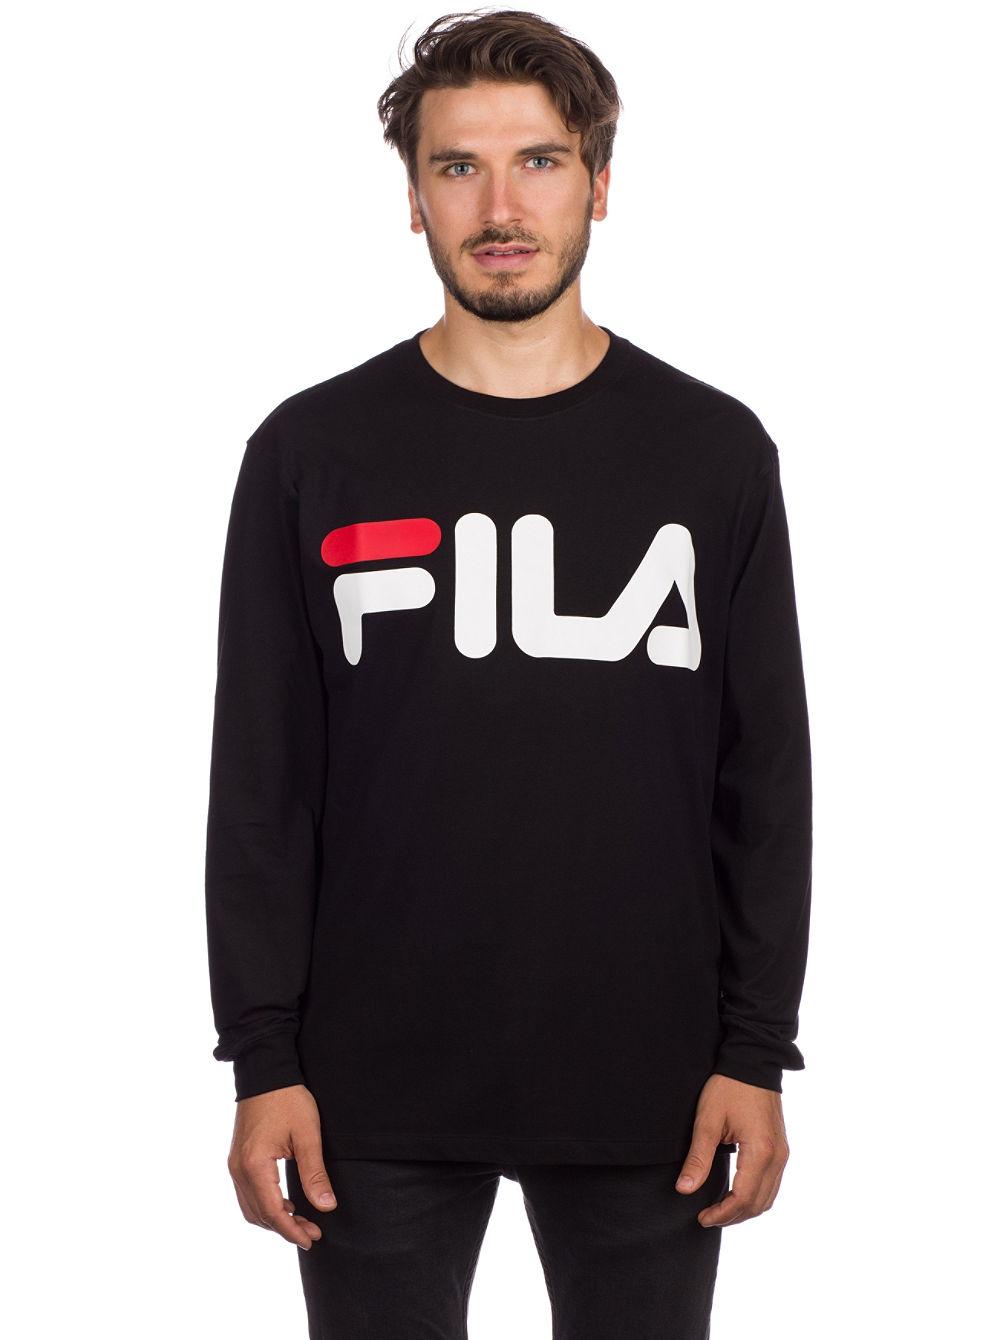 918ce12175325 Buy Fila Classioc Logo Long Sleeve T-Shirt online at blue-tomato.com